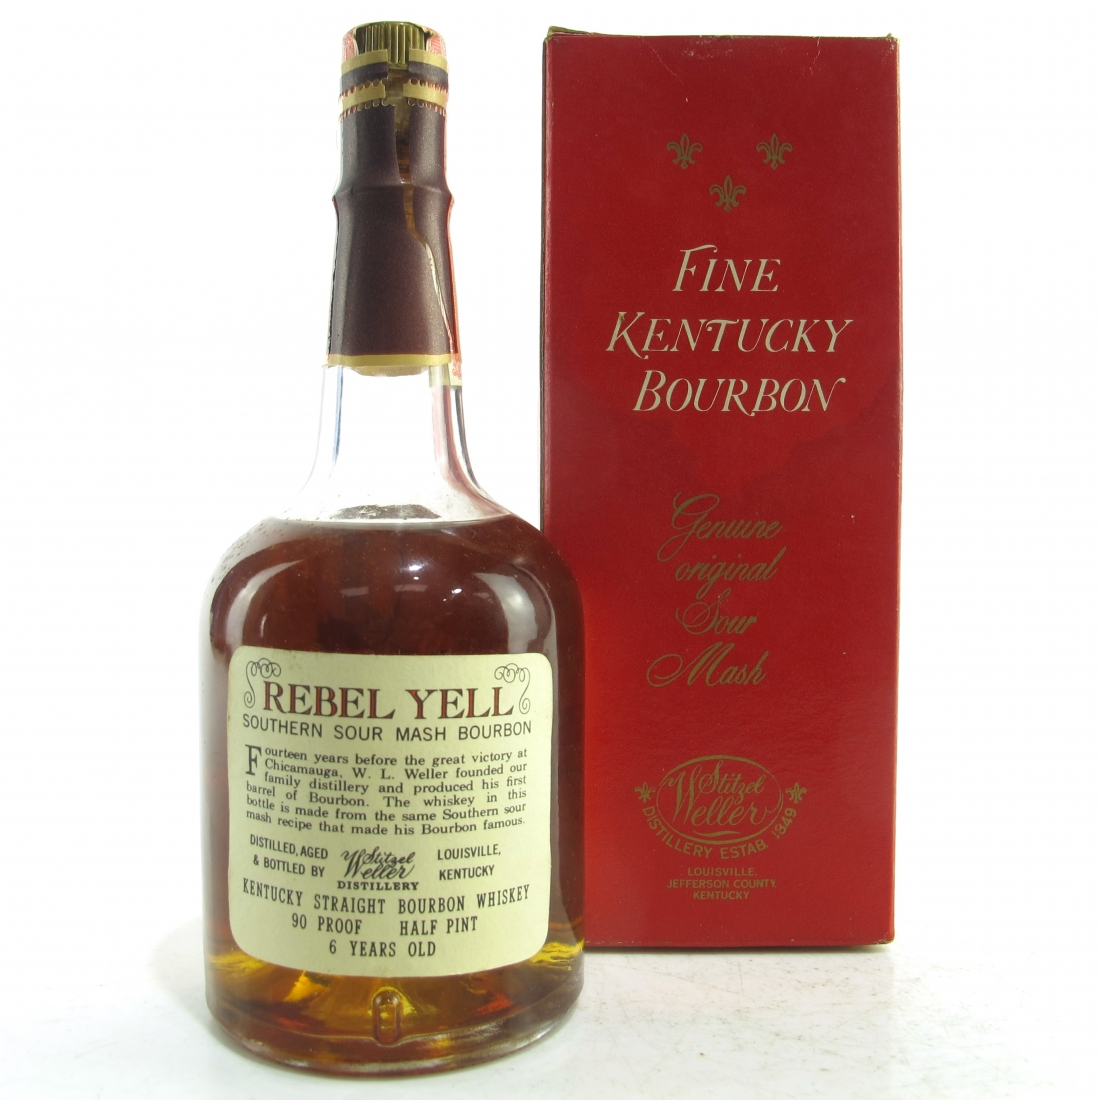 Rebel Yell 6 Year Old Kentucky Straight Bourbon Half Pint 1970s / Stitzel-Weller